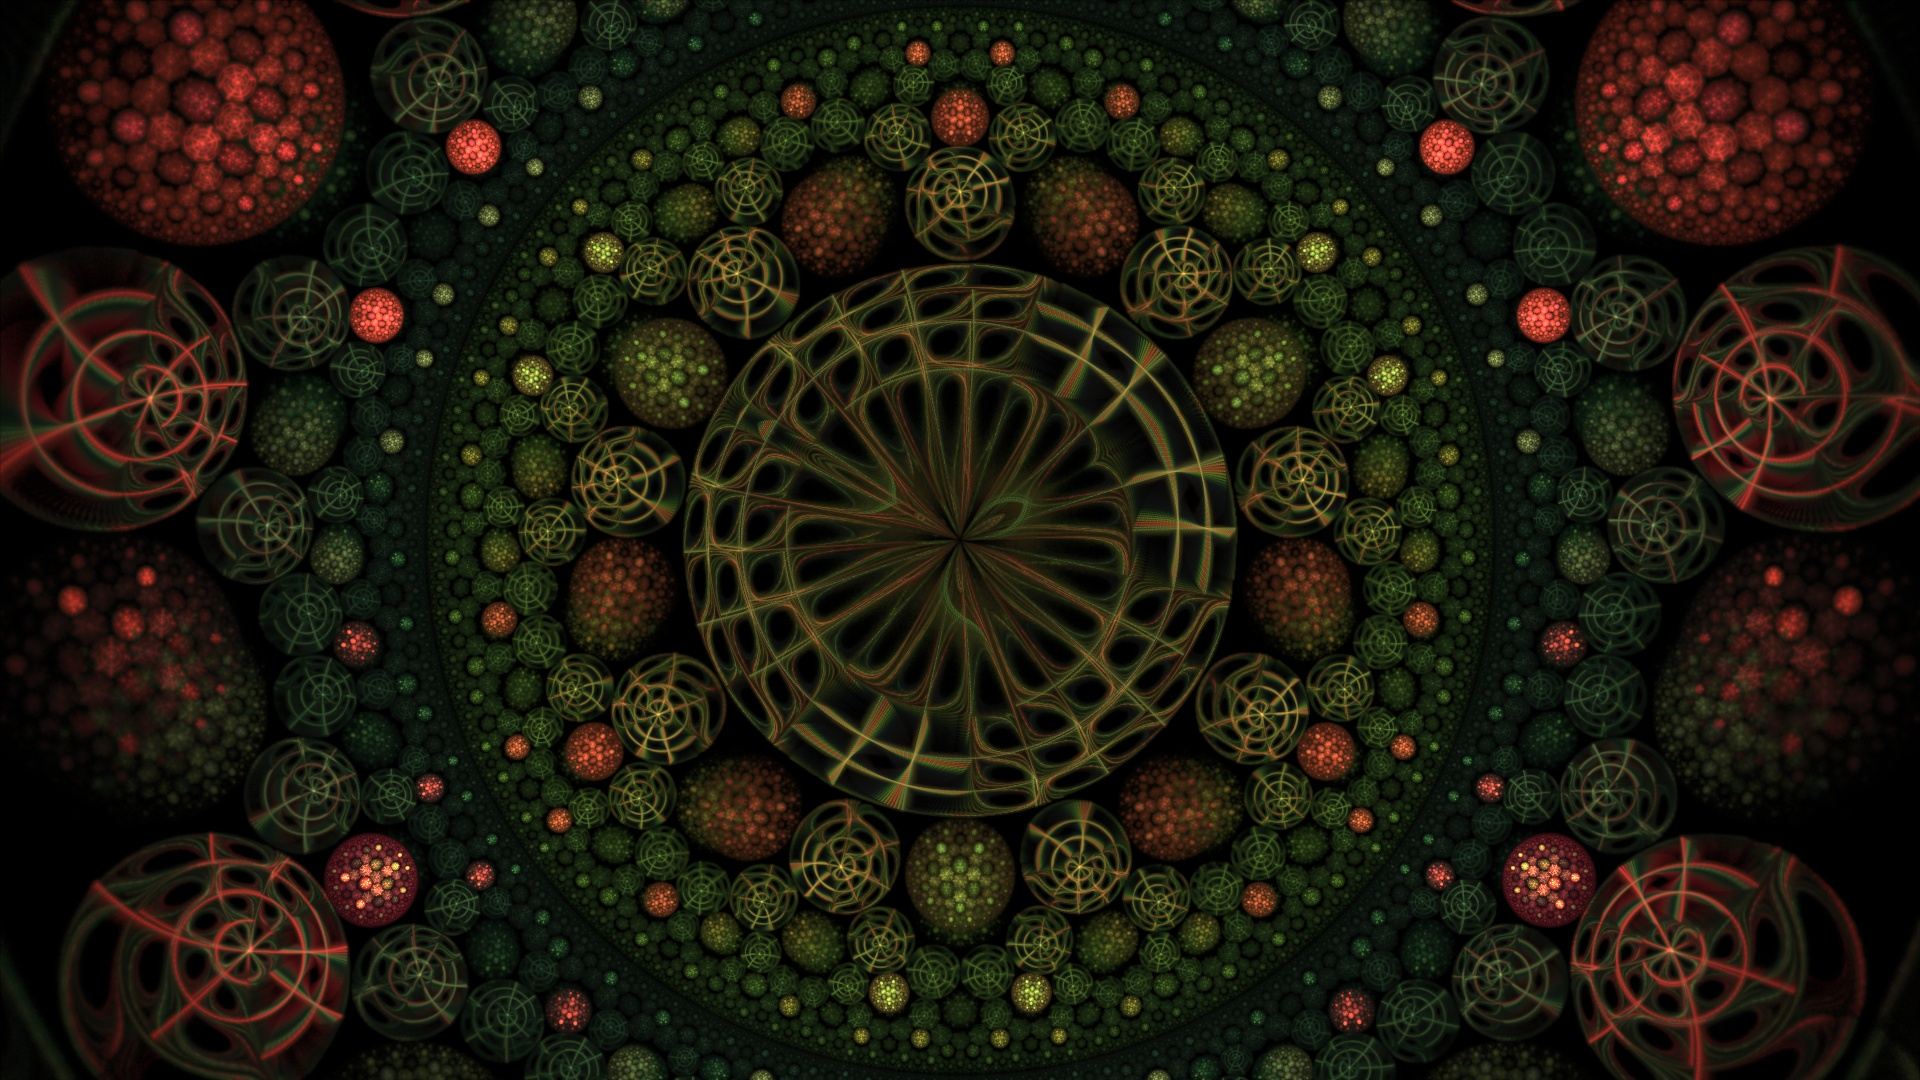 Hyperbolic garden by thargor6